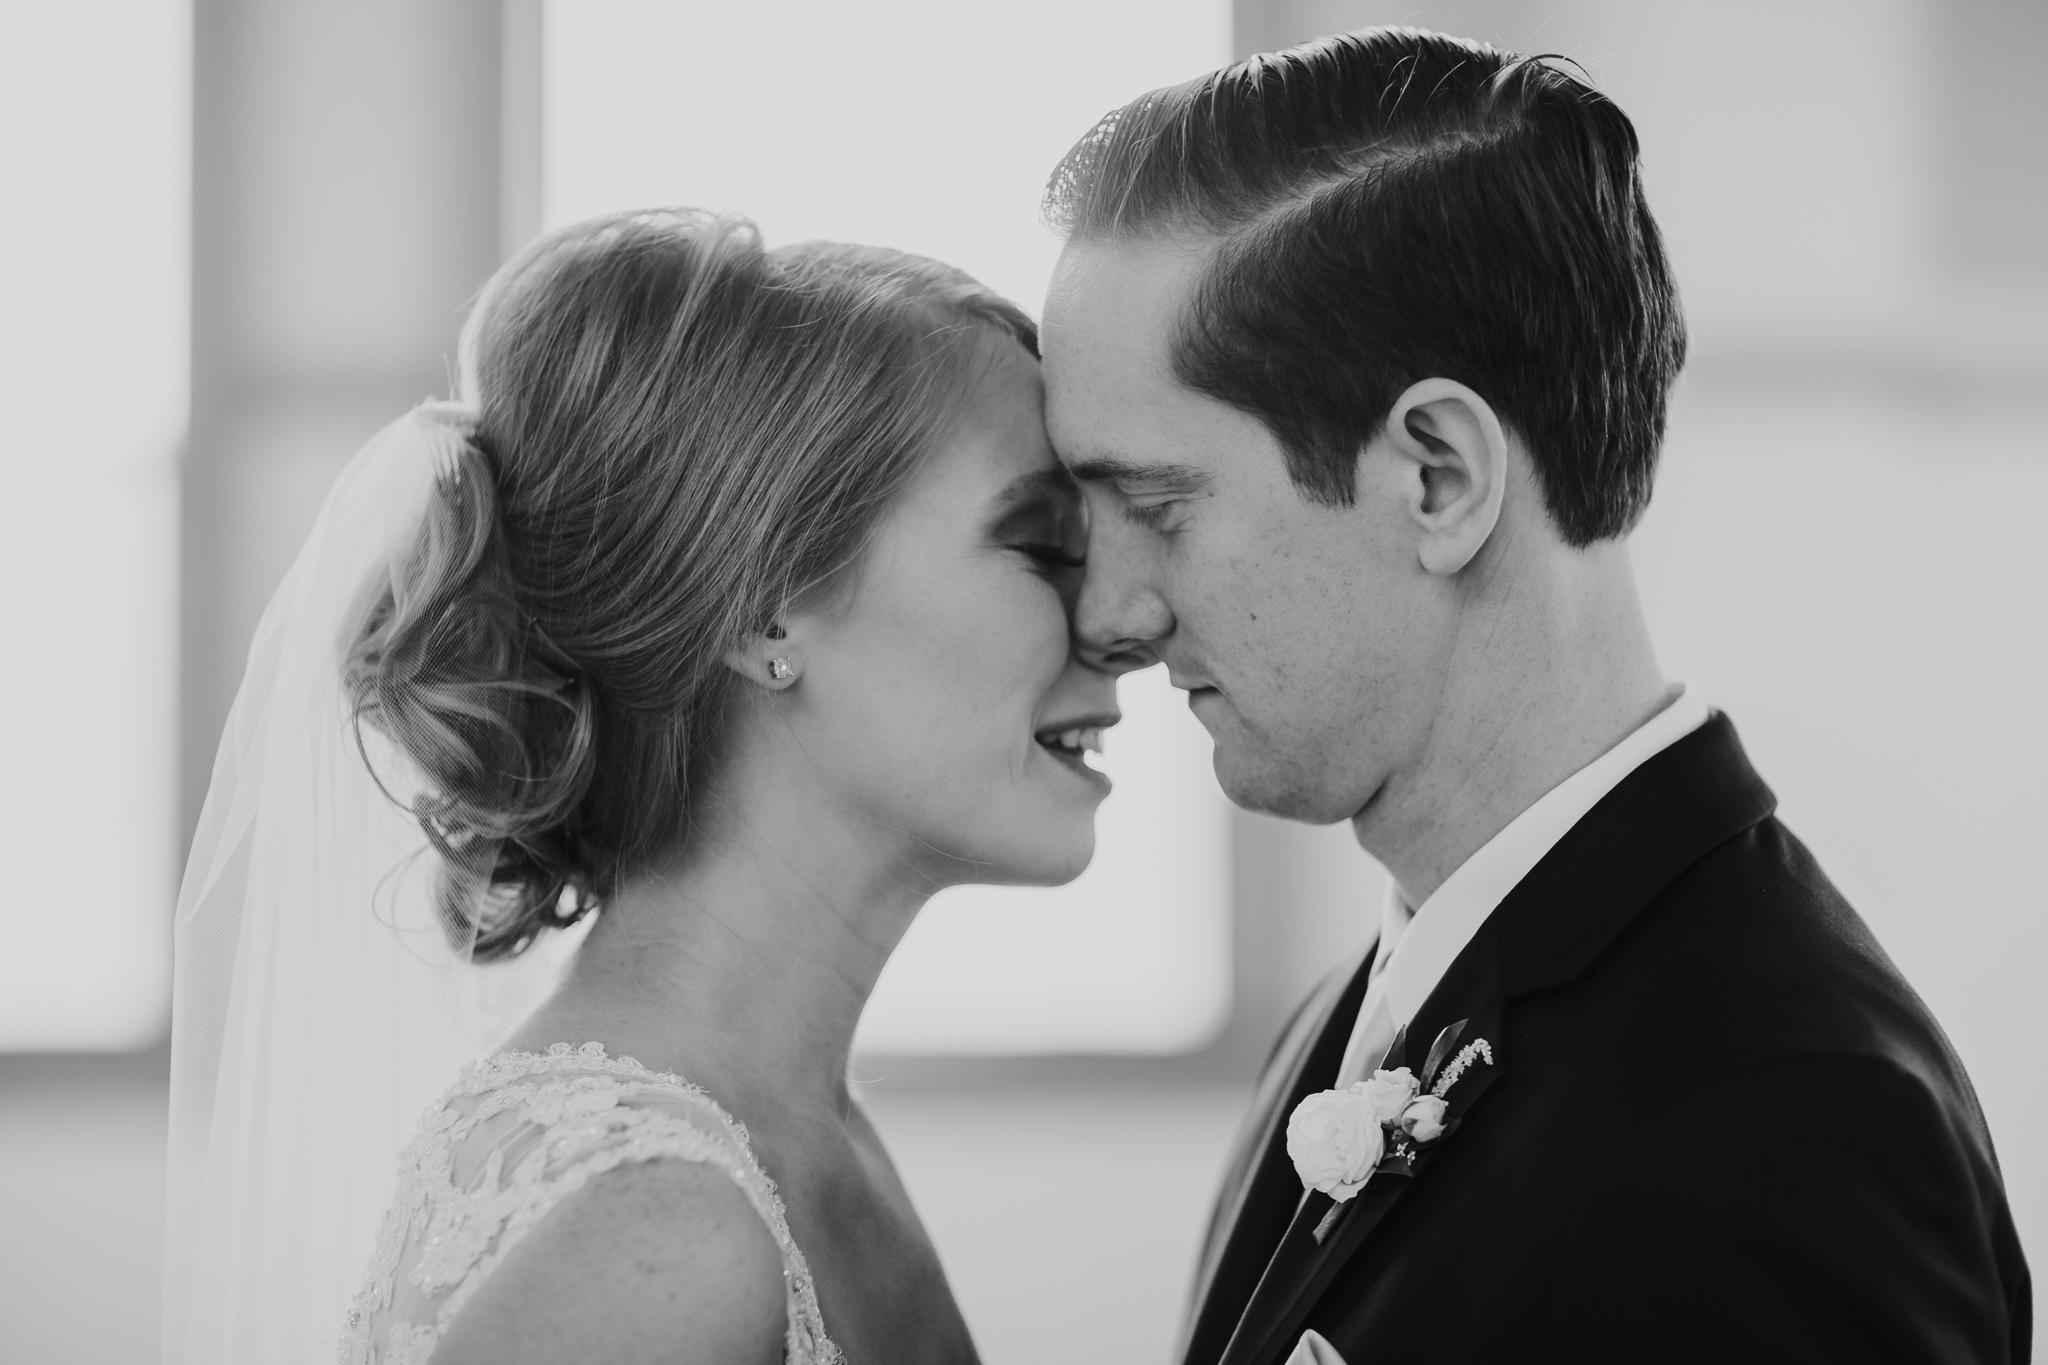 Michael and Kelly - the ashton depot - wedding DFW - wedding photographer- elizalde photography (67 of 150).jpg